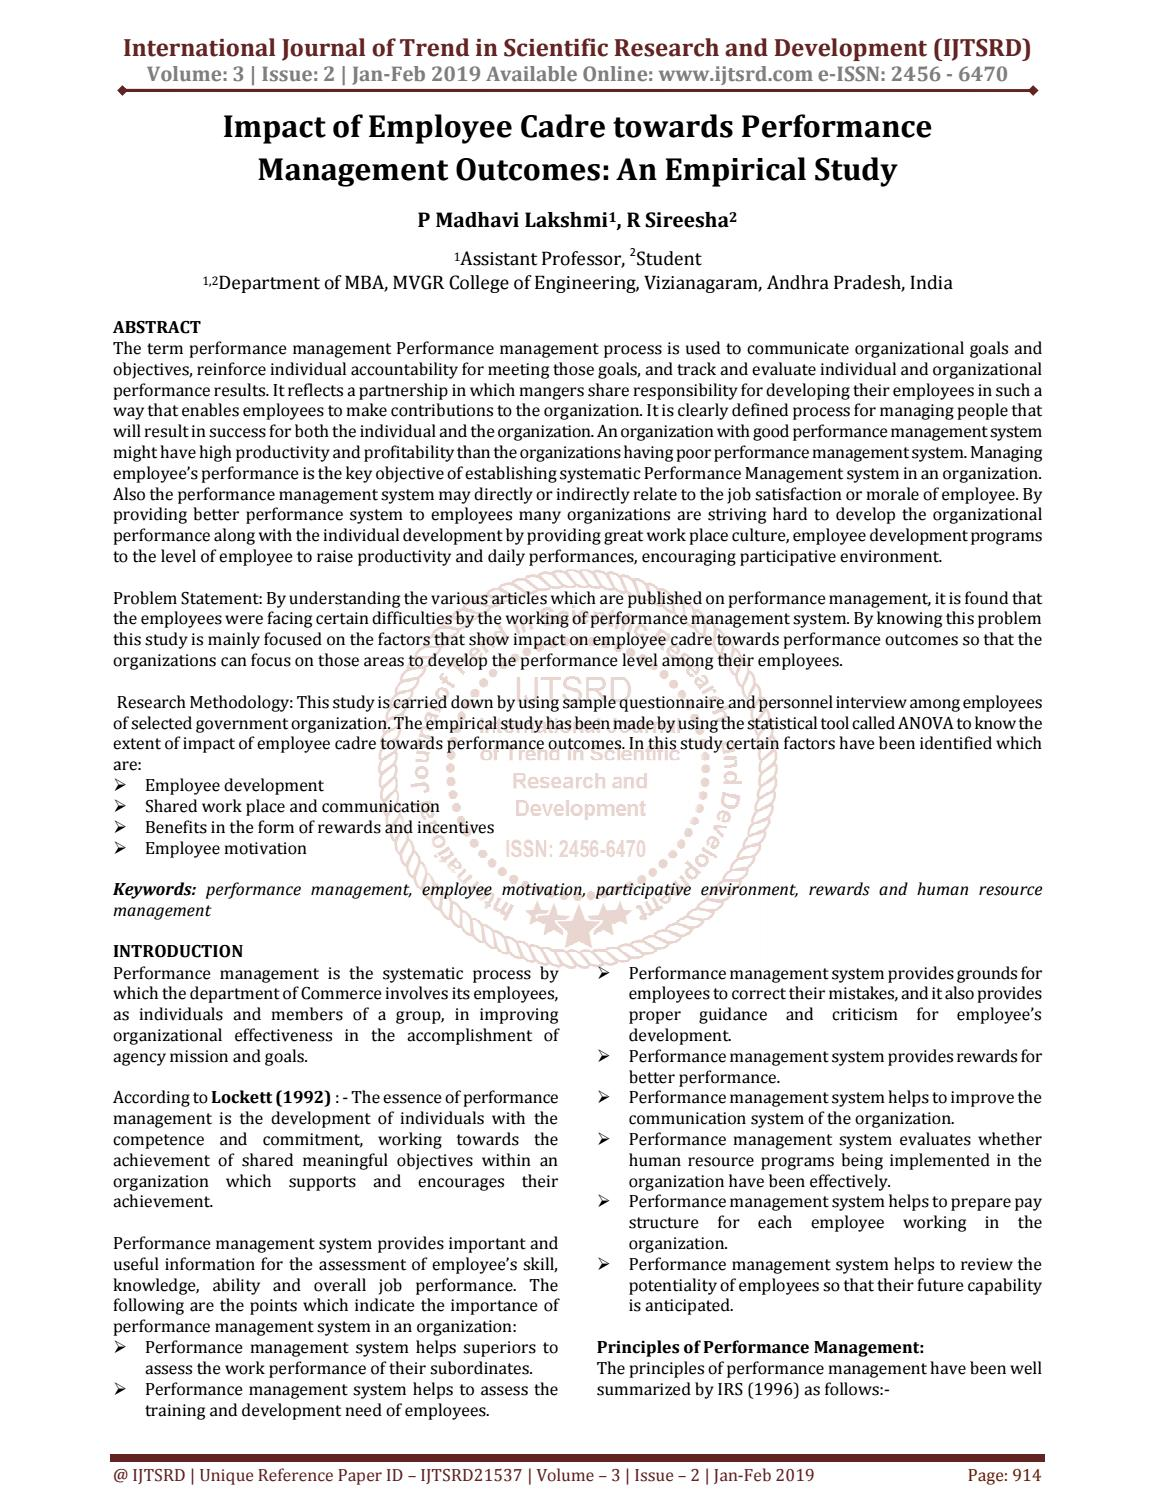 Impact Of Employee Cadre Towards Performance Management